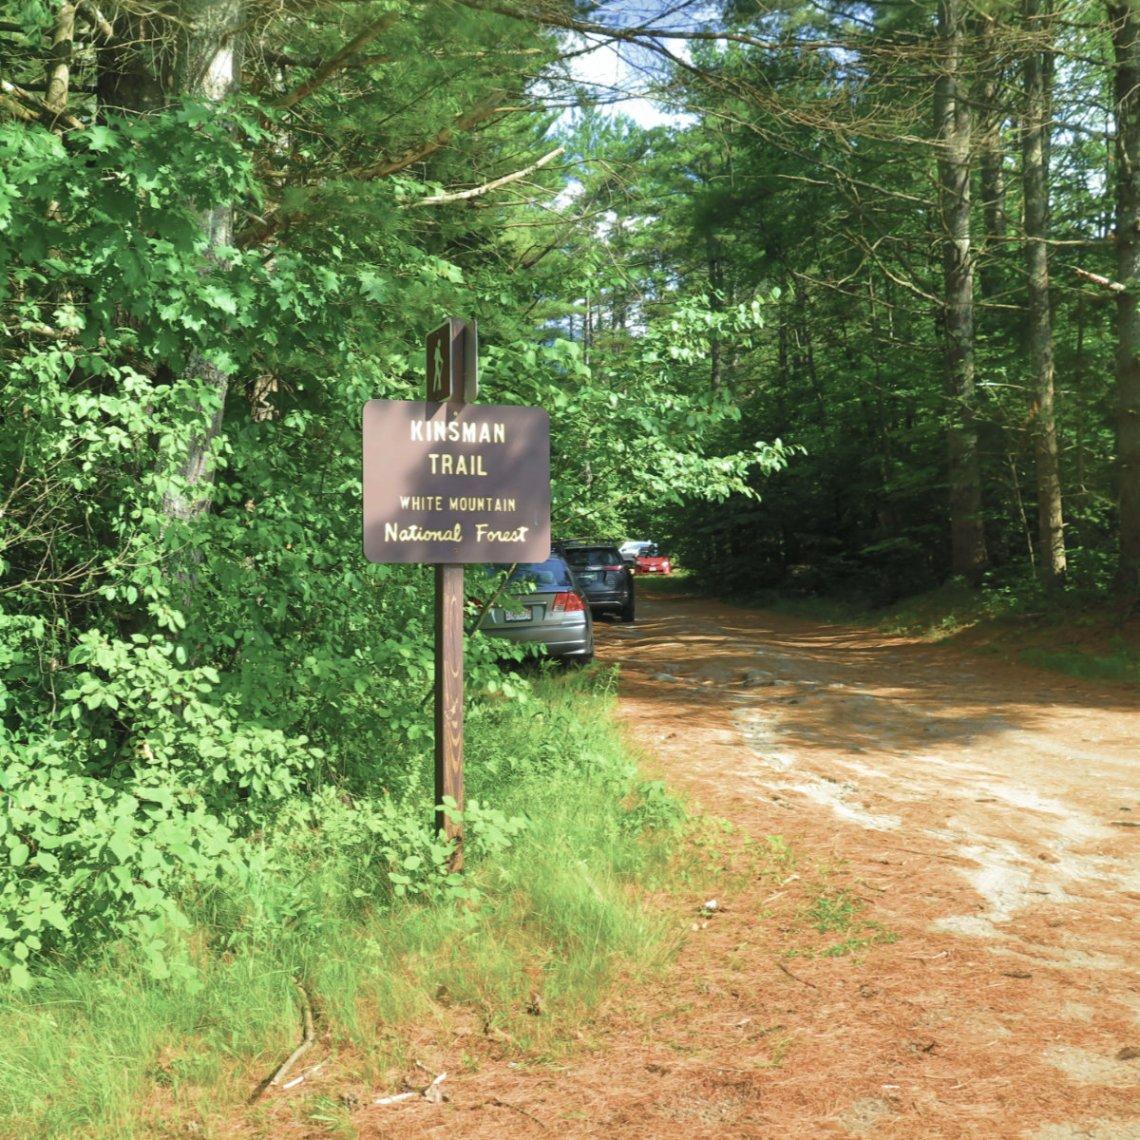 Kinsman_Trail_Road_Sign_20190713